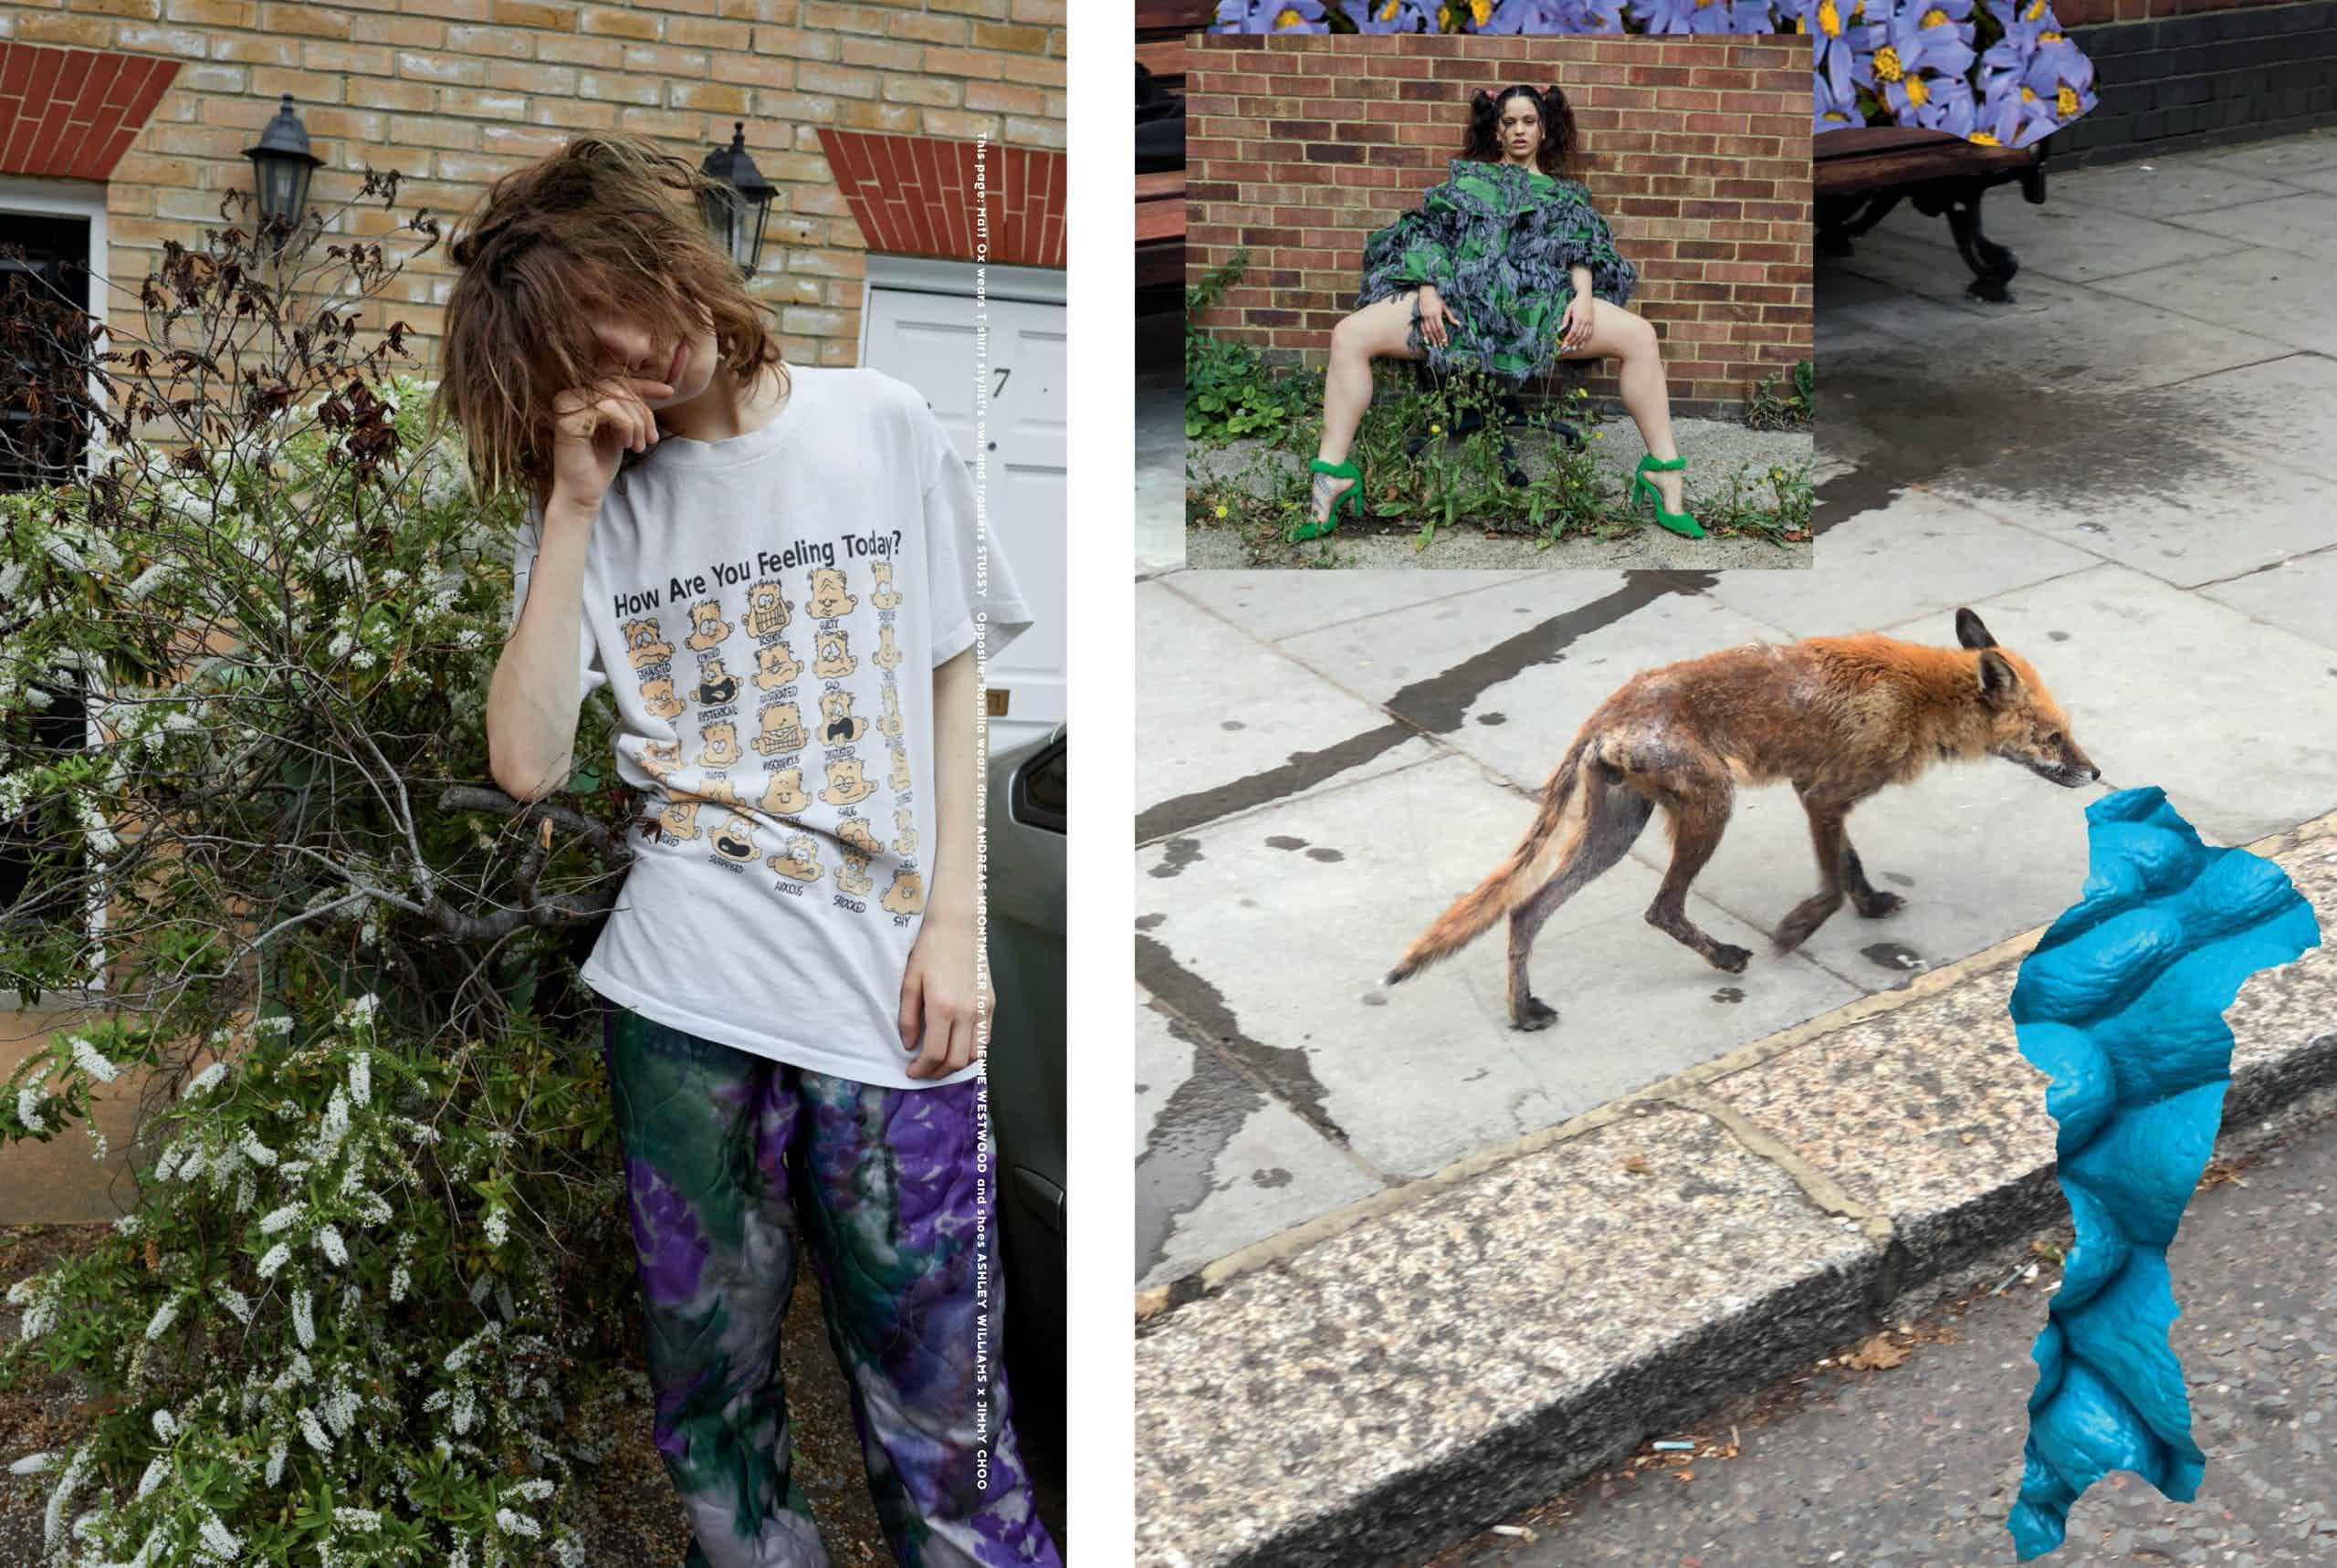 THE FACE - Autumn 2019 Photographer: Juergen Teller Model: Rosalía Location: London